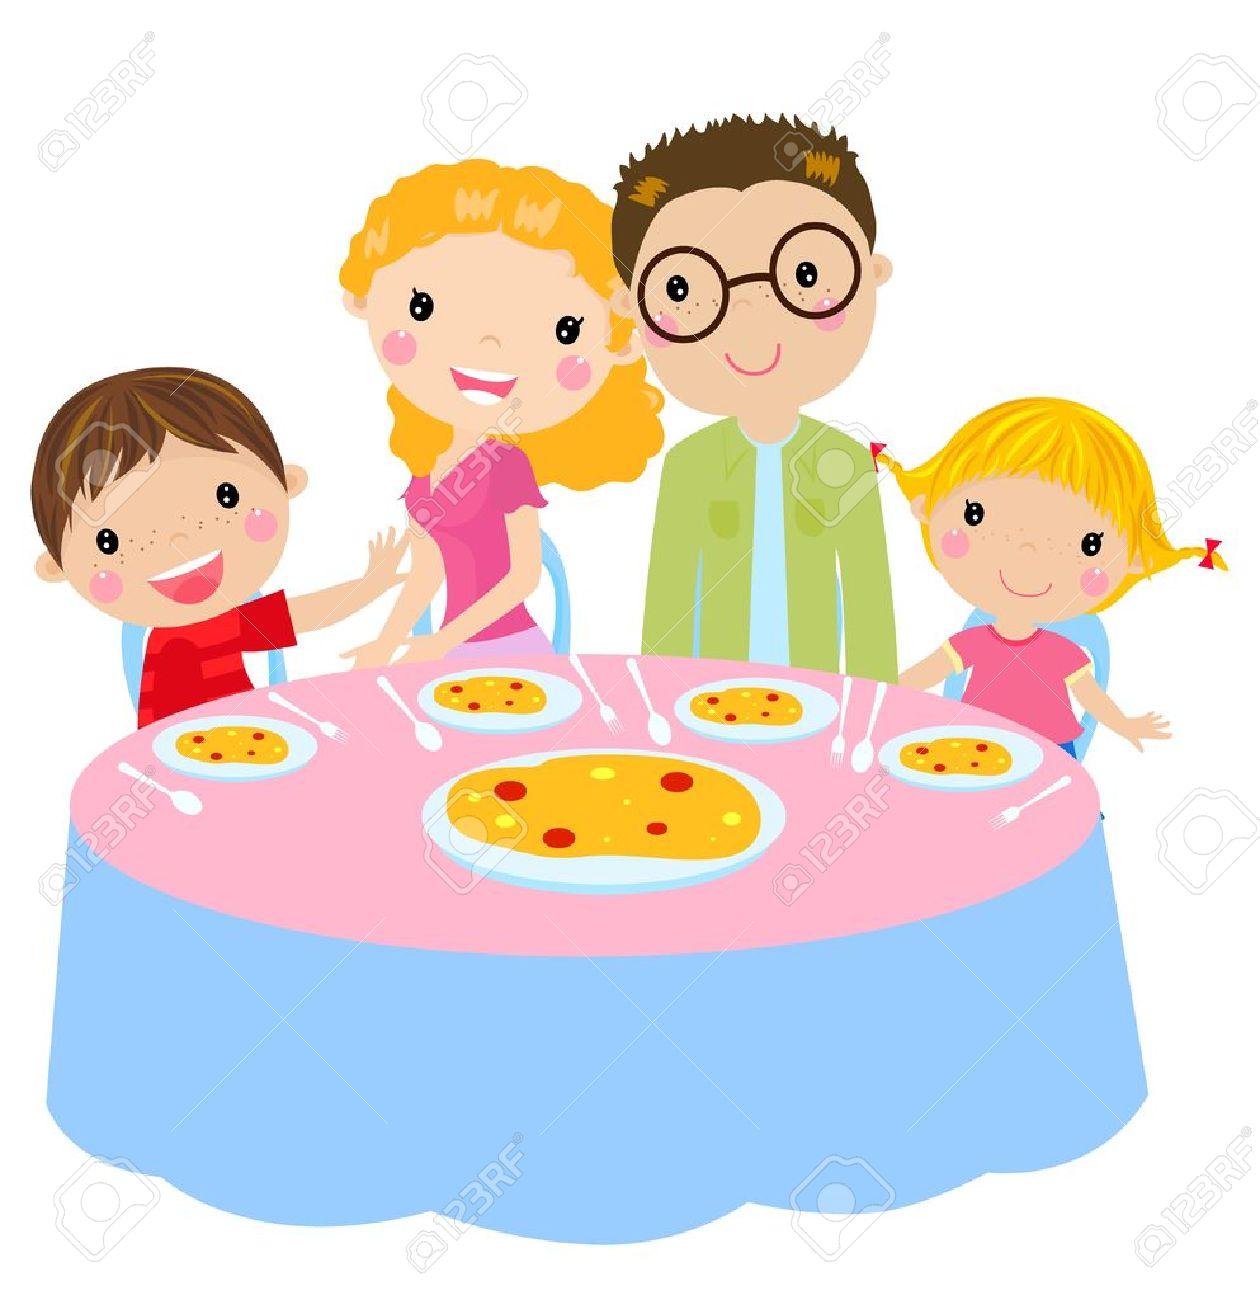 family dinner royalty free cliparts vectors and stock illustration rh 123rf com family dinner clipart free family eating dinner clipart black and white